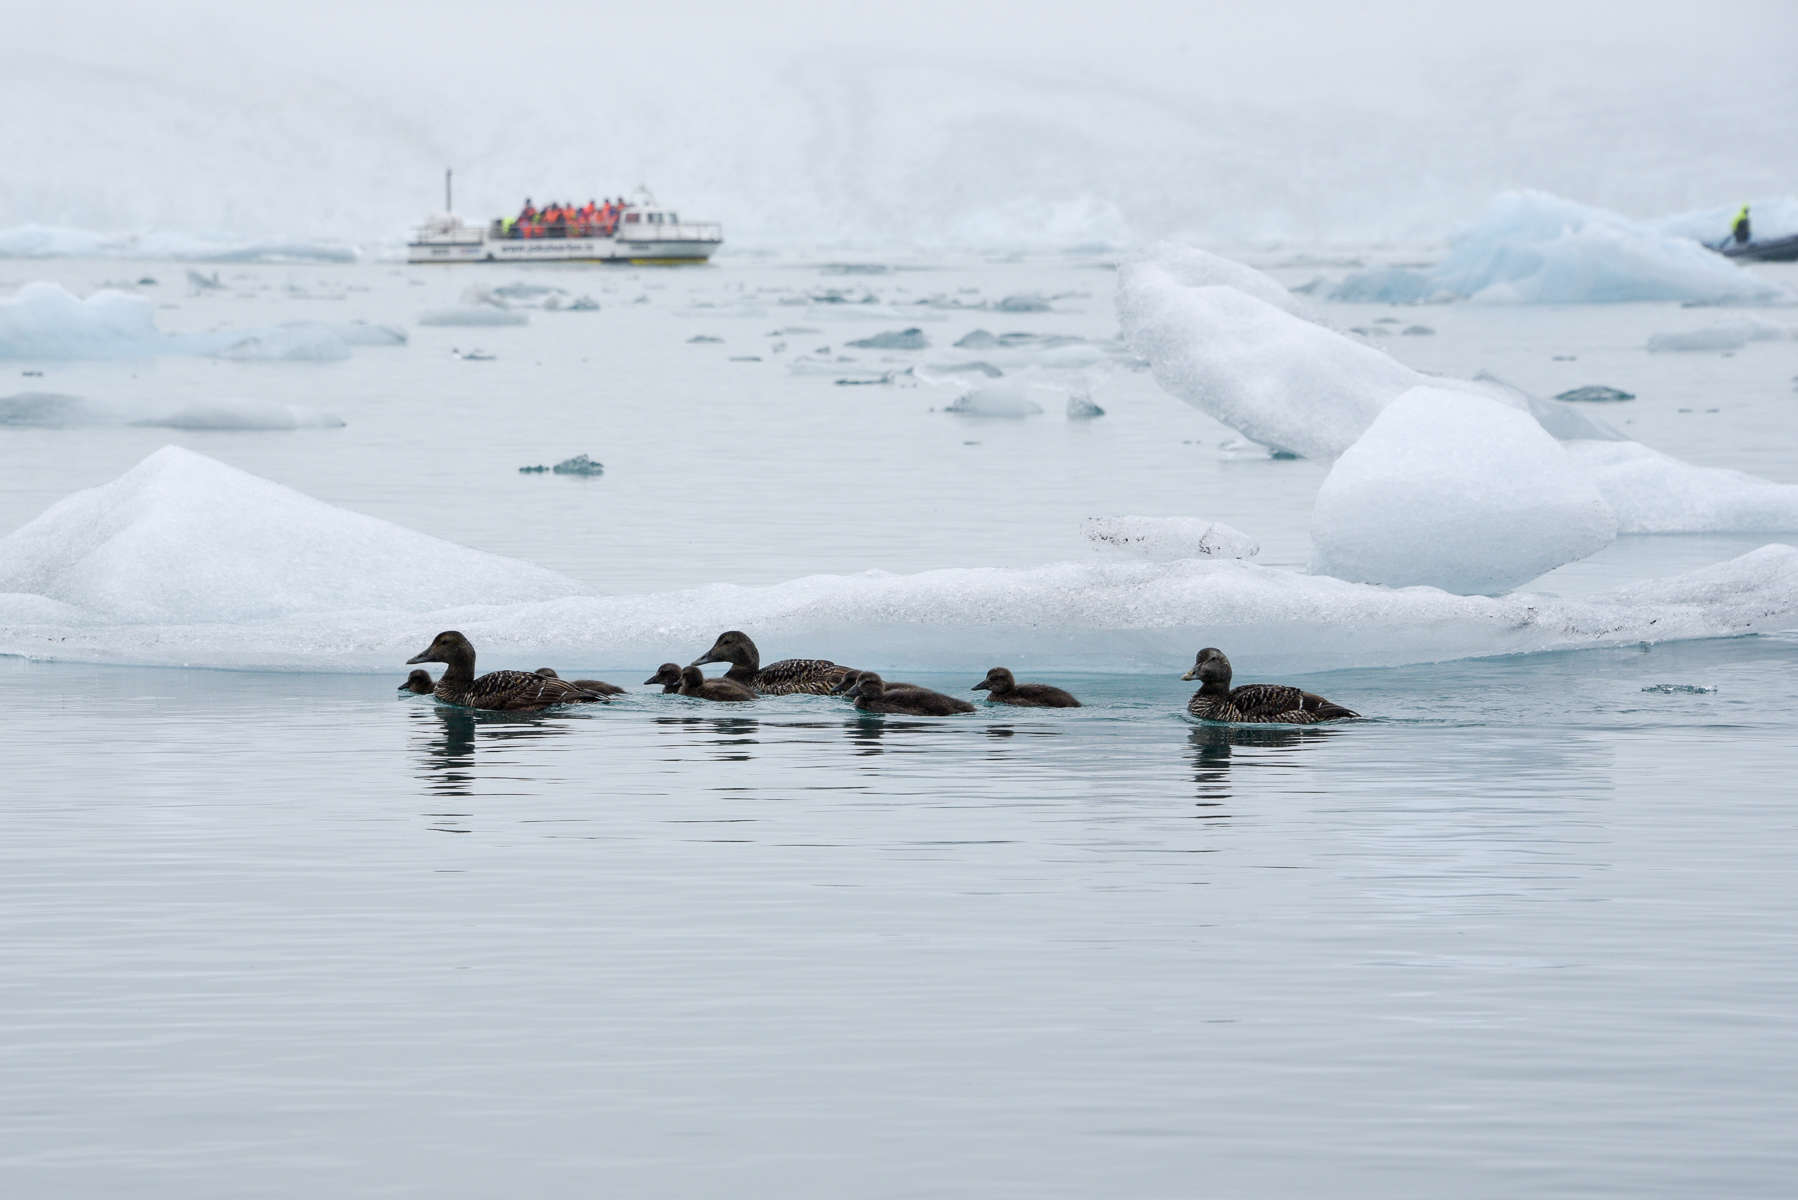 Ducks at Jökulsárlón Iceberg Lagoon, Iceland